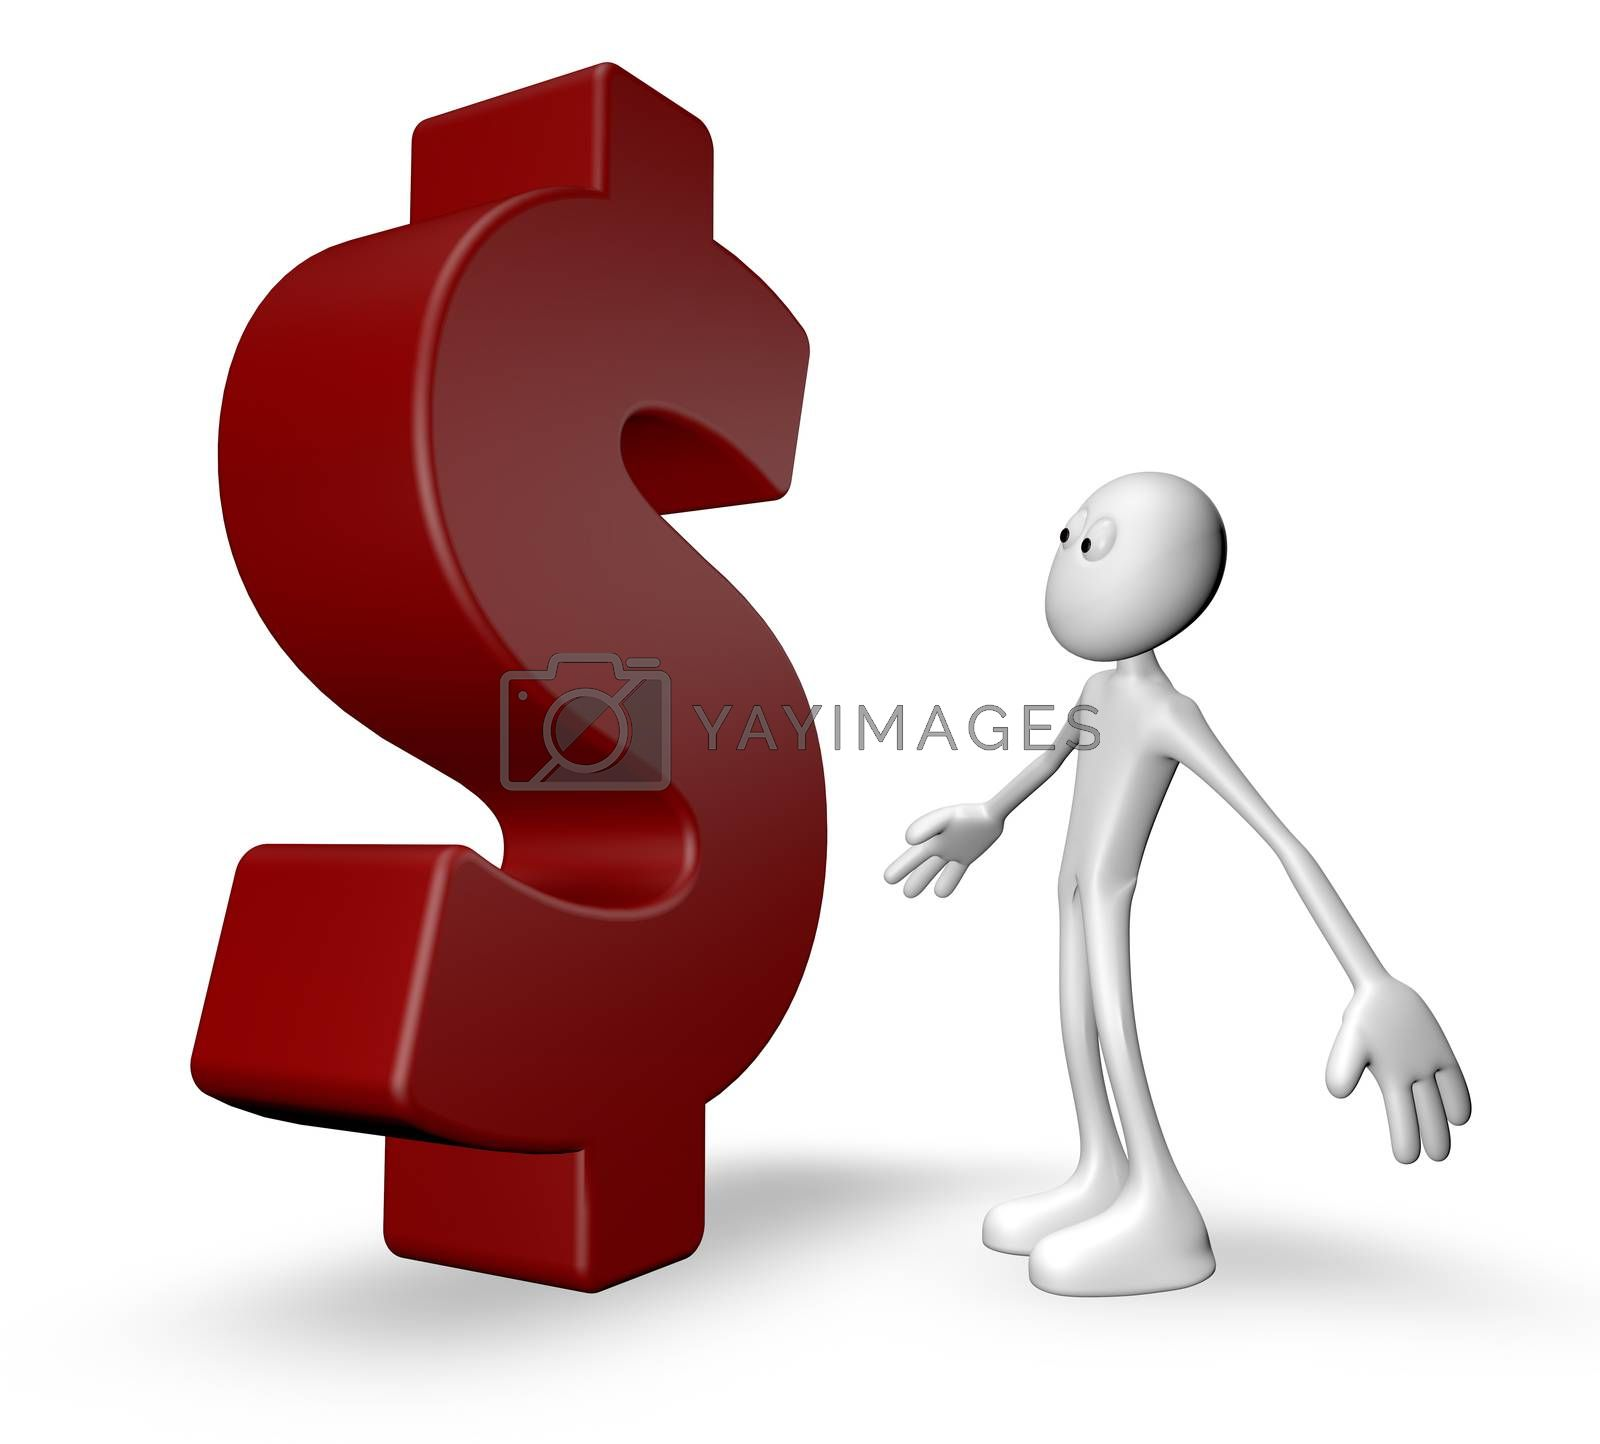 white guy and dollar symbol - 3d illustration